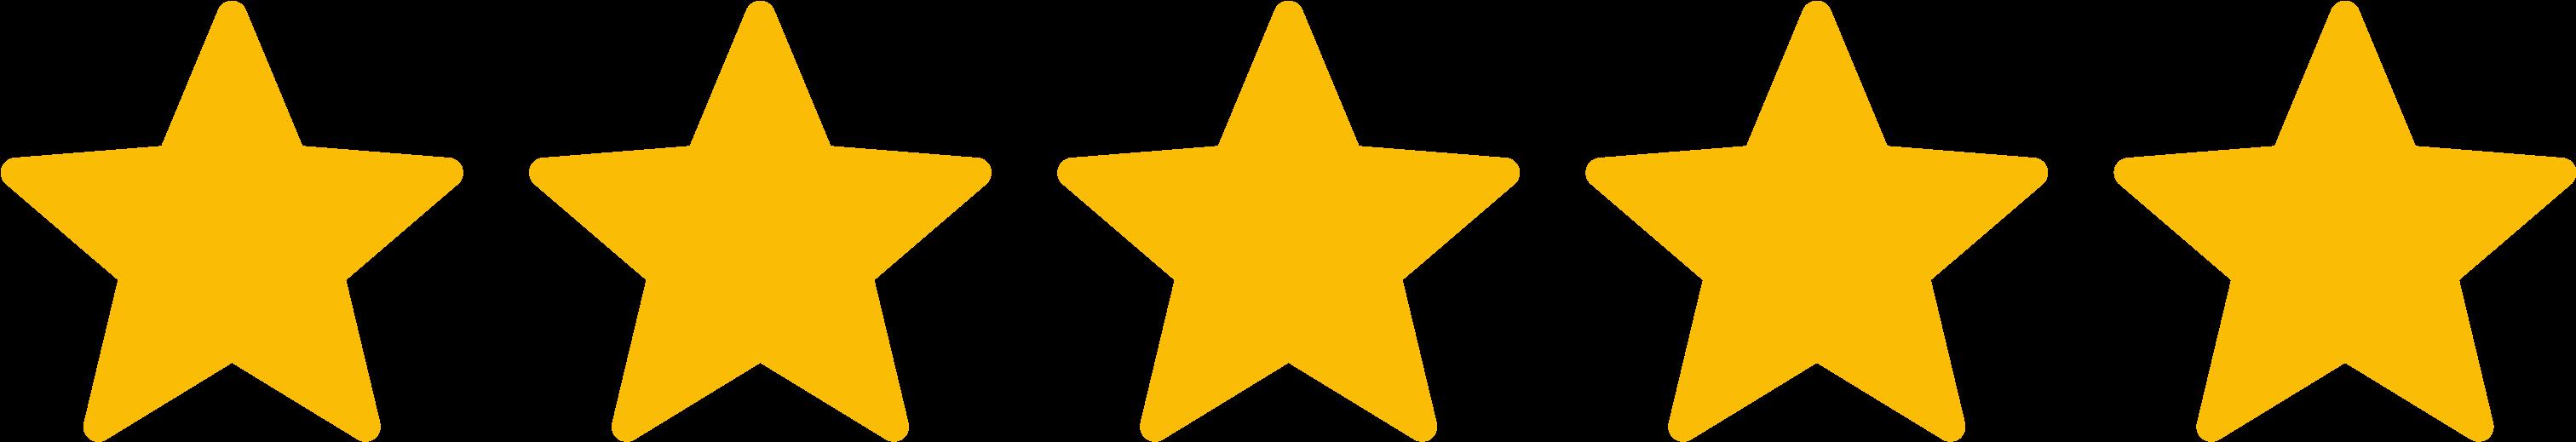 icône cinq étoiles